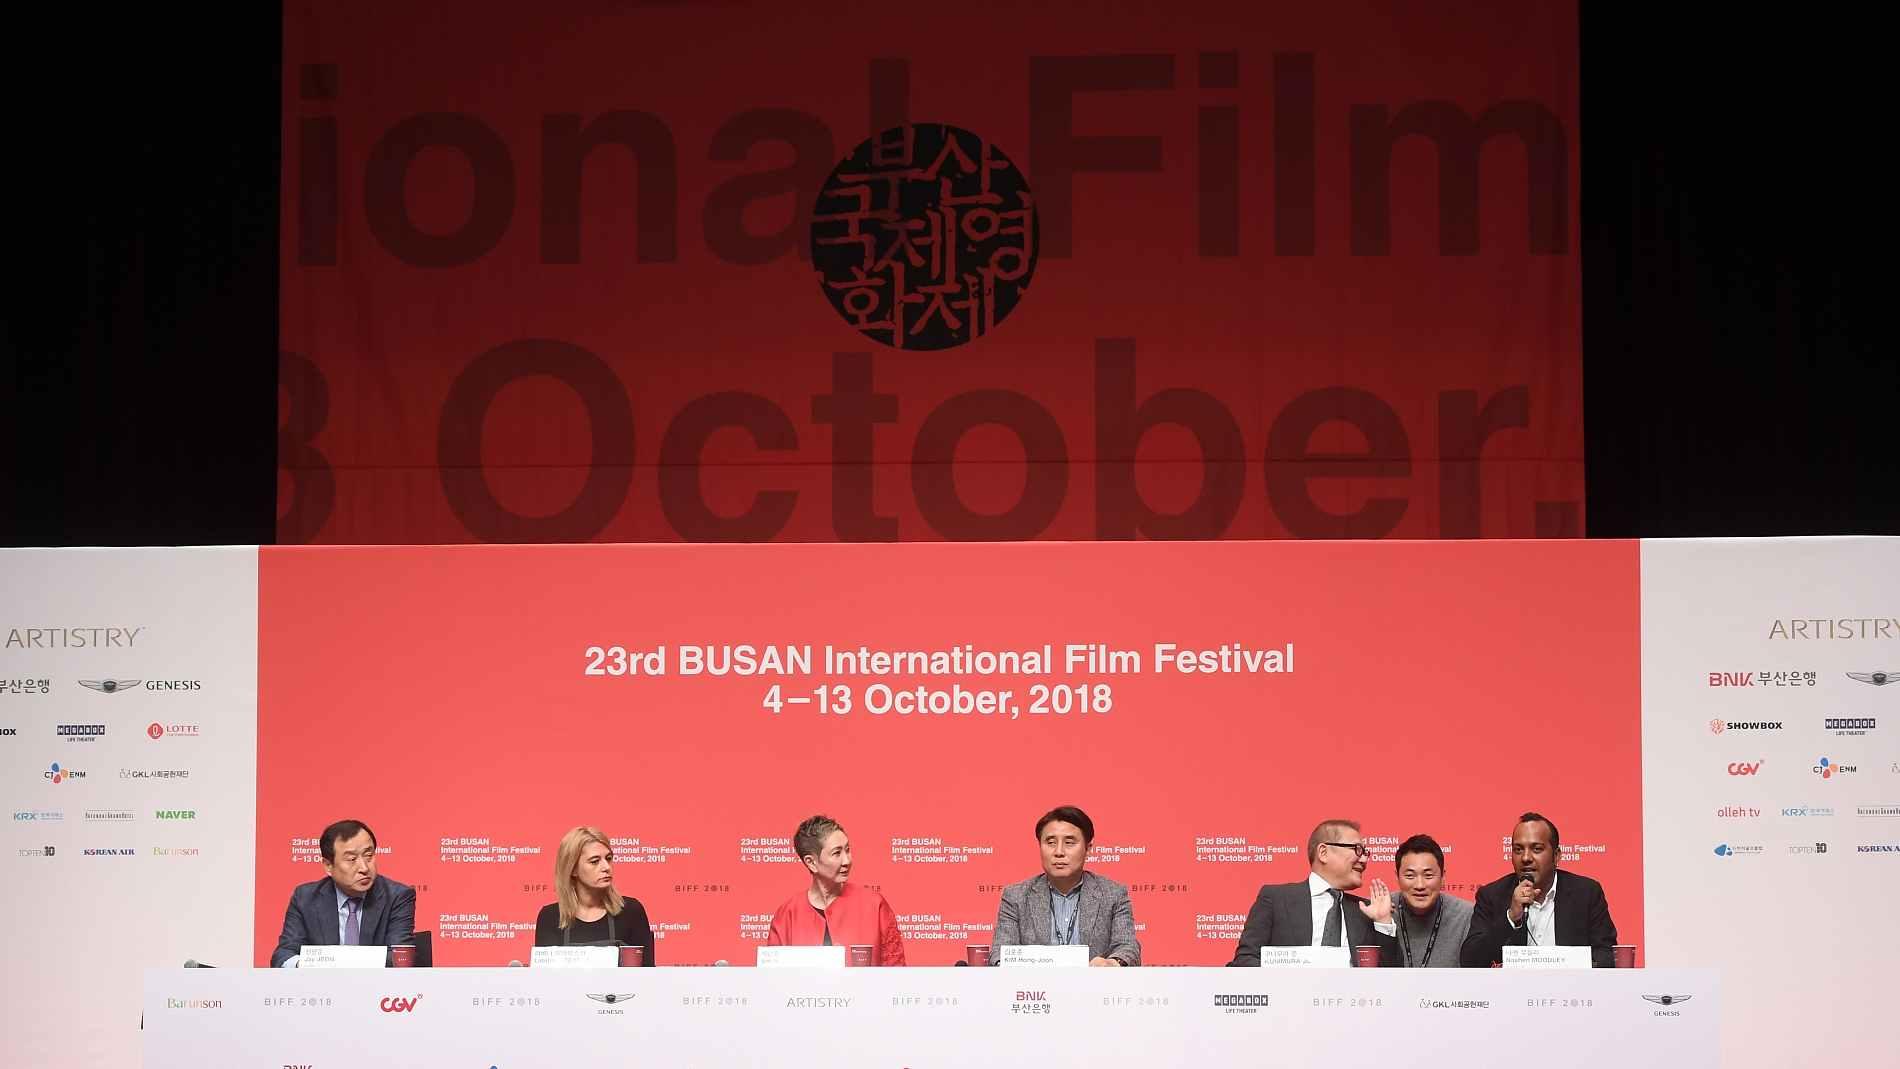 A Chinese action debut and South Korean family drama win at Busan